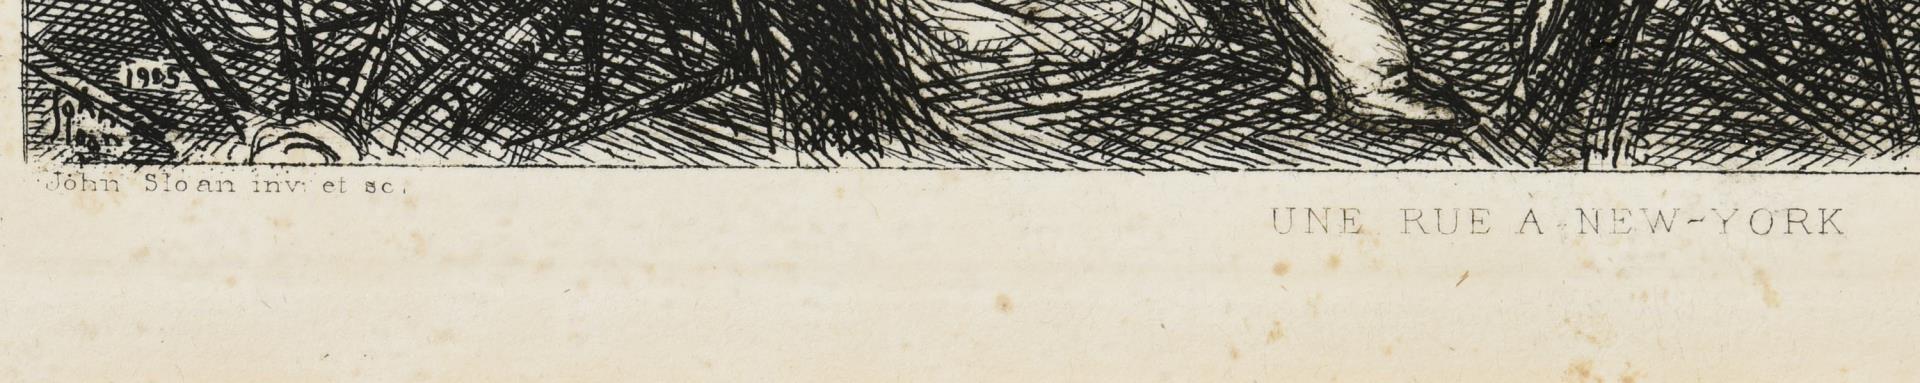 Lot 103: 3 Prints incl. Sloan